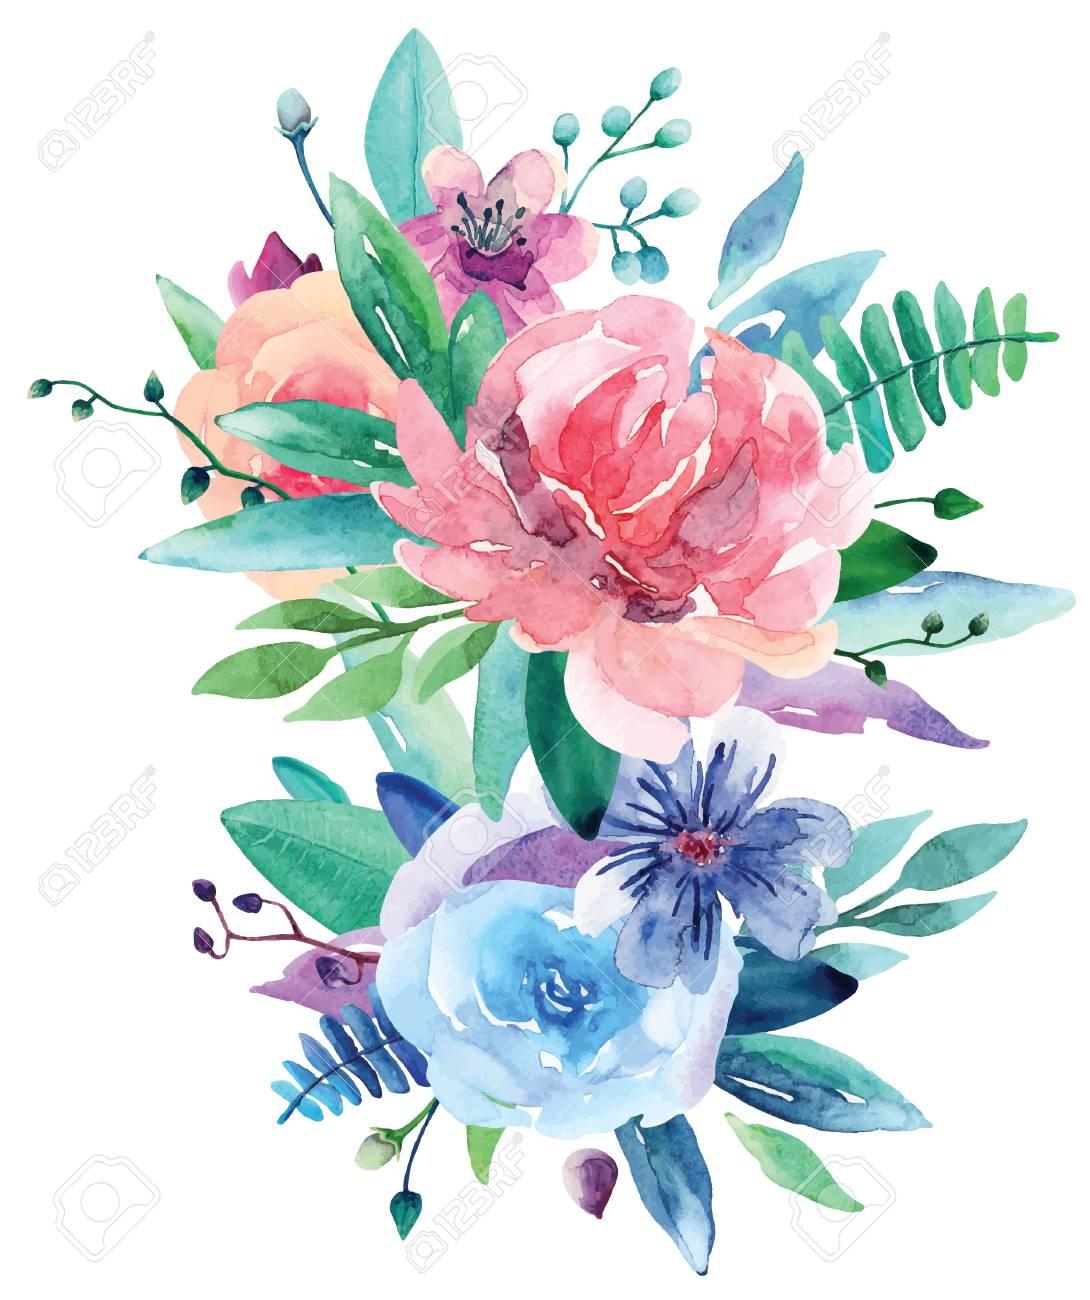 Watercolor floral bouquet vector clip art pink and blue flowers vector watercolor floral bouquet vector clip art pink and blue flowers illustration mightylinksfo